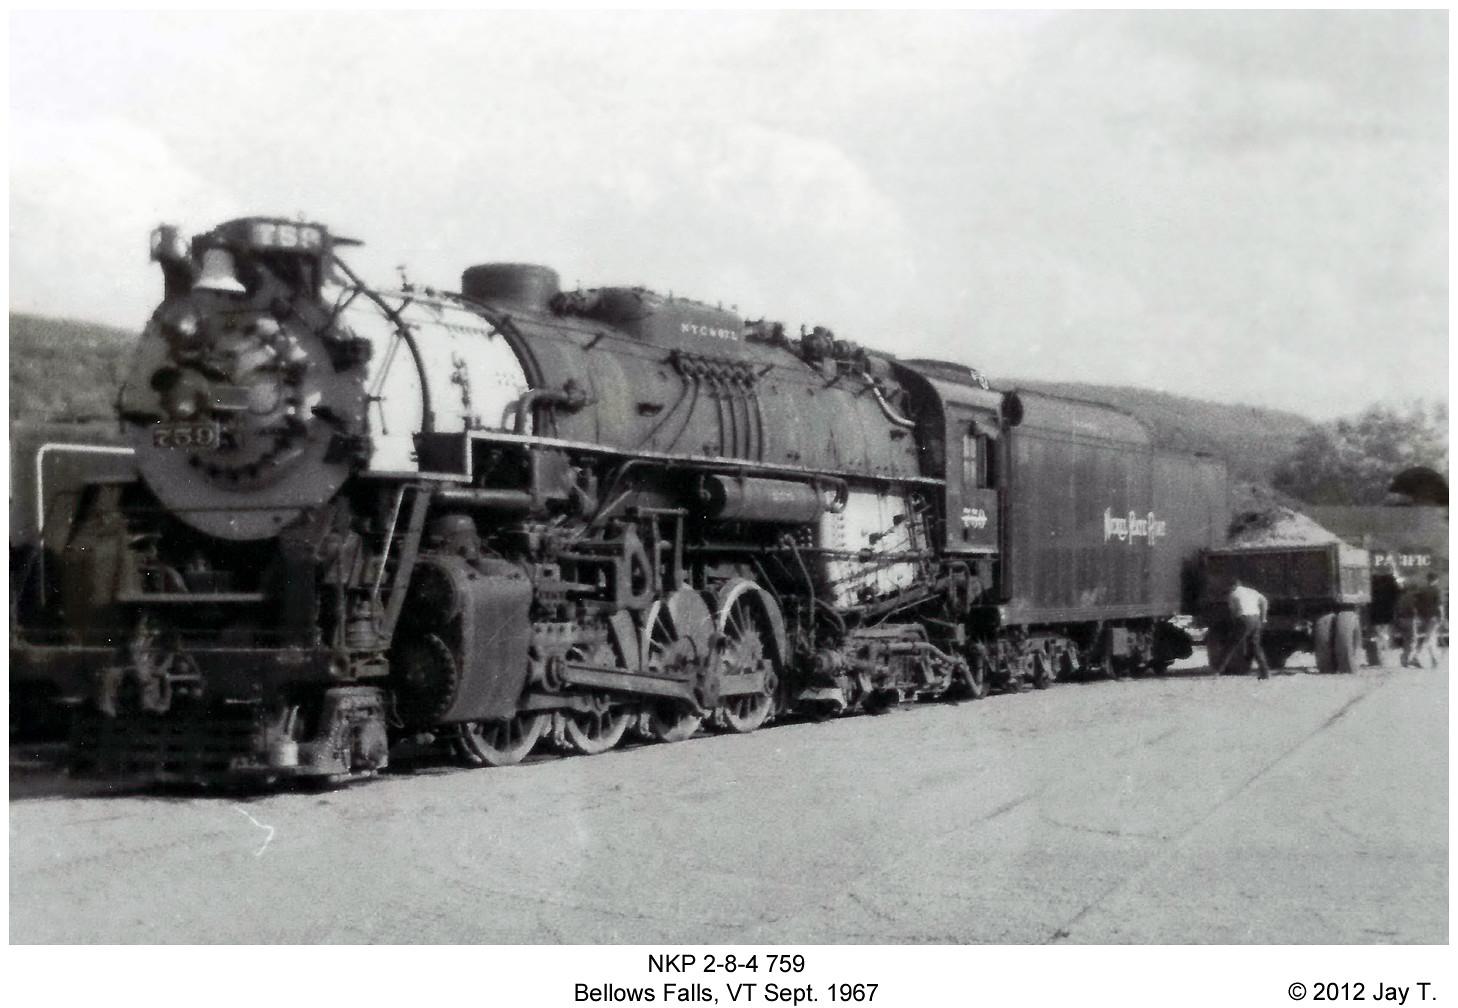 NKP 2-8-4 759